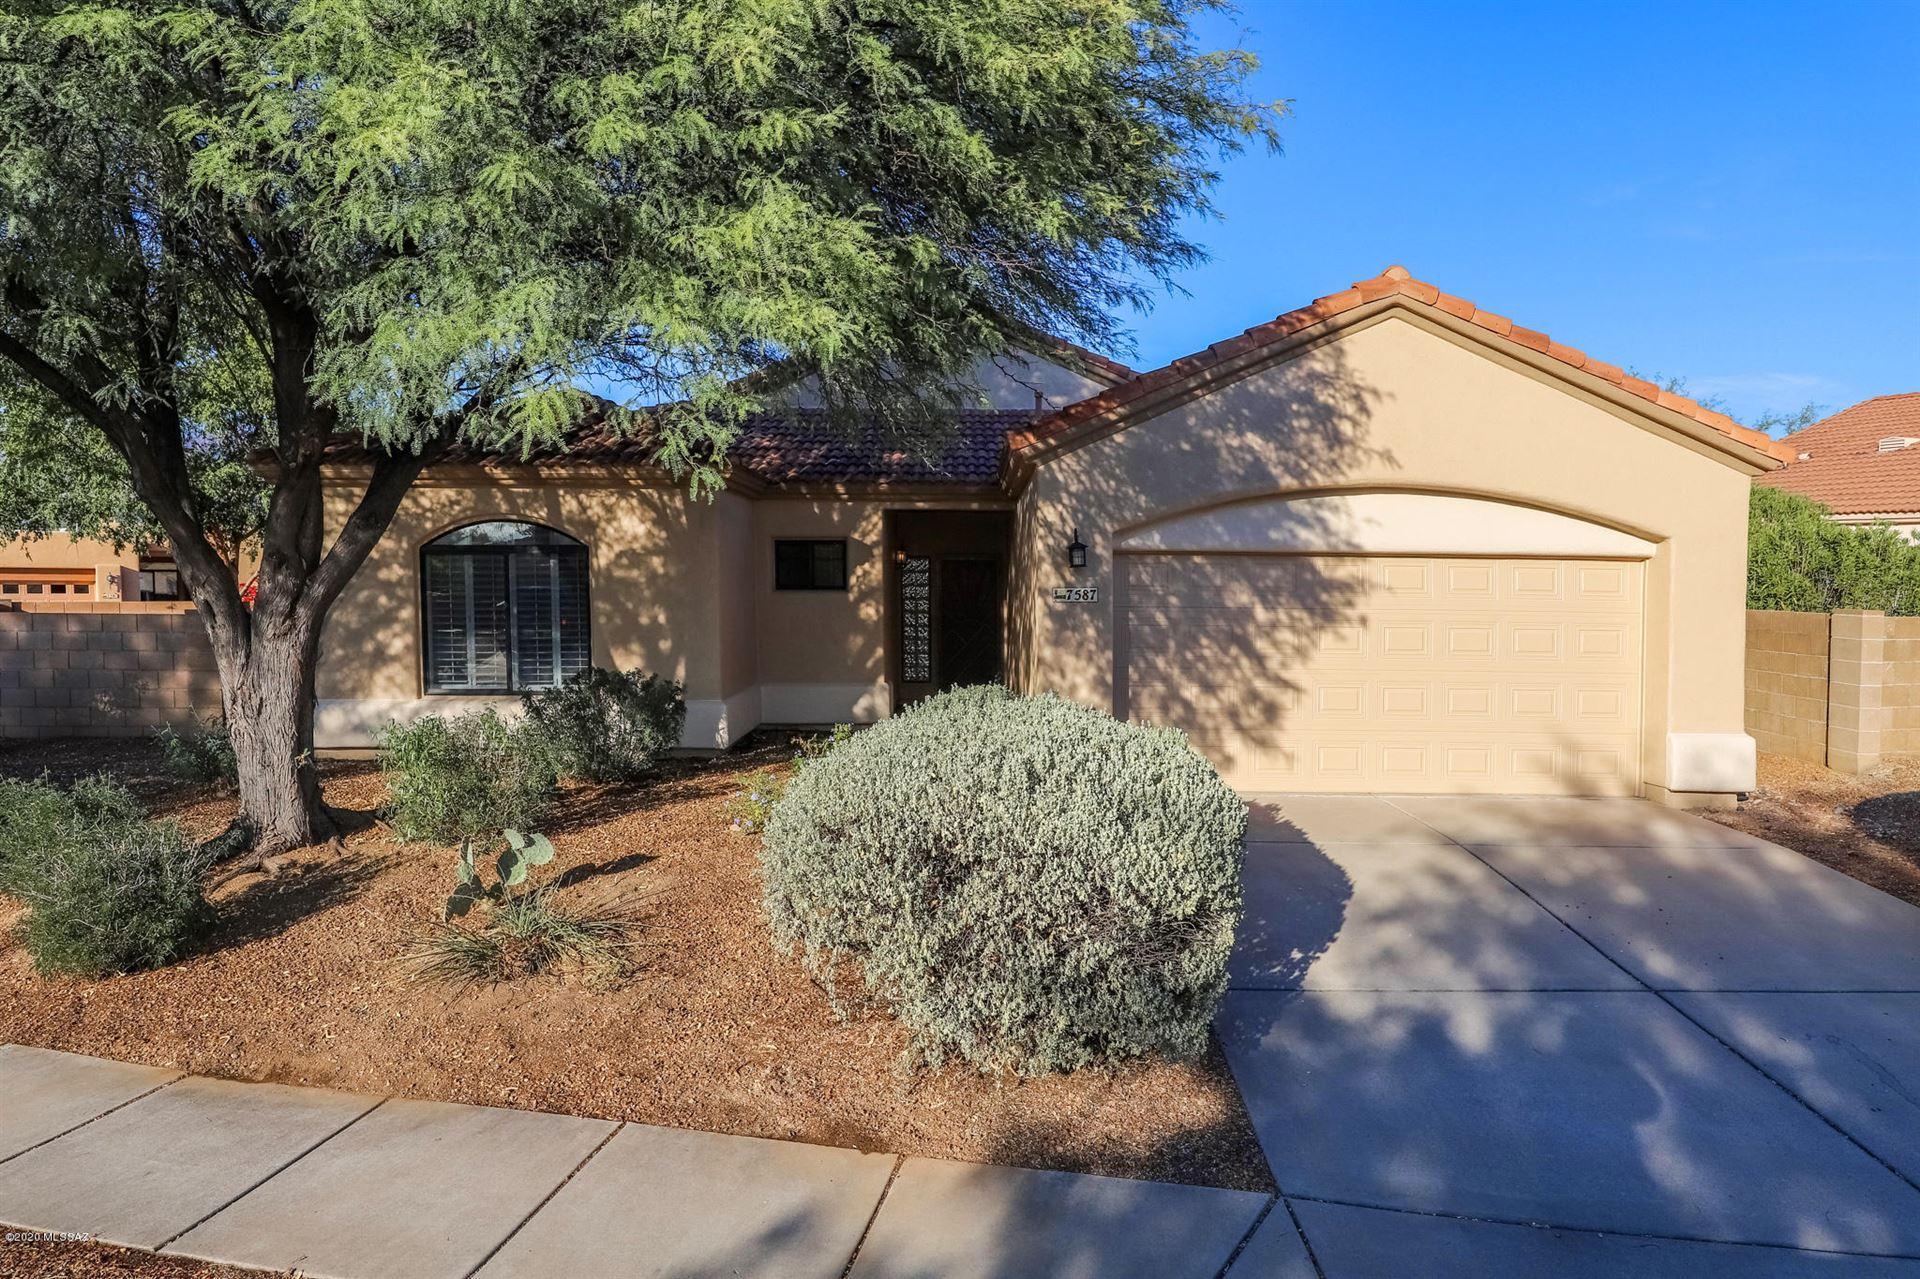 7587 E Golden River Lane, Tucson, AZ 85715 - #: 22025914